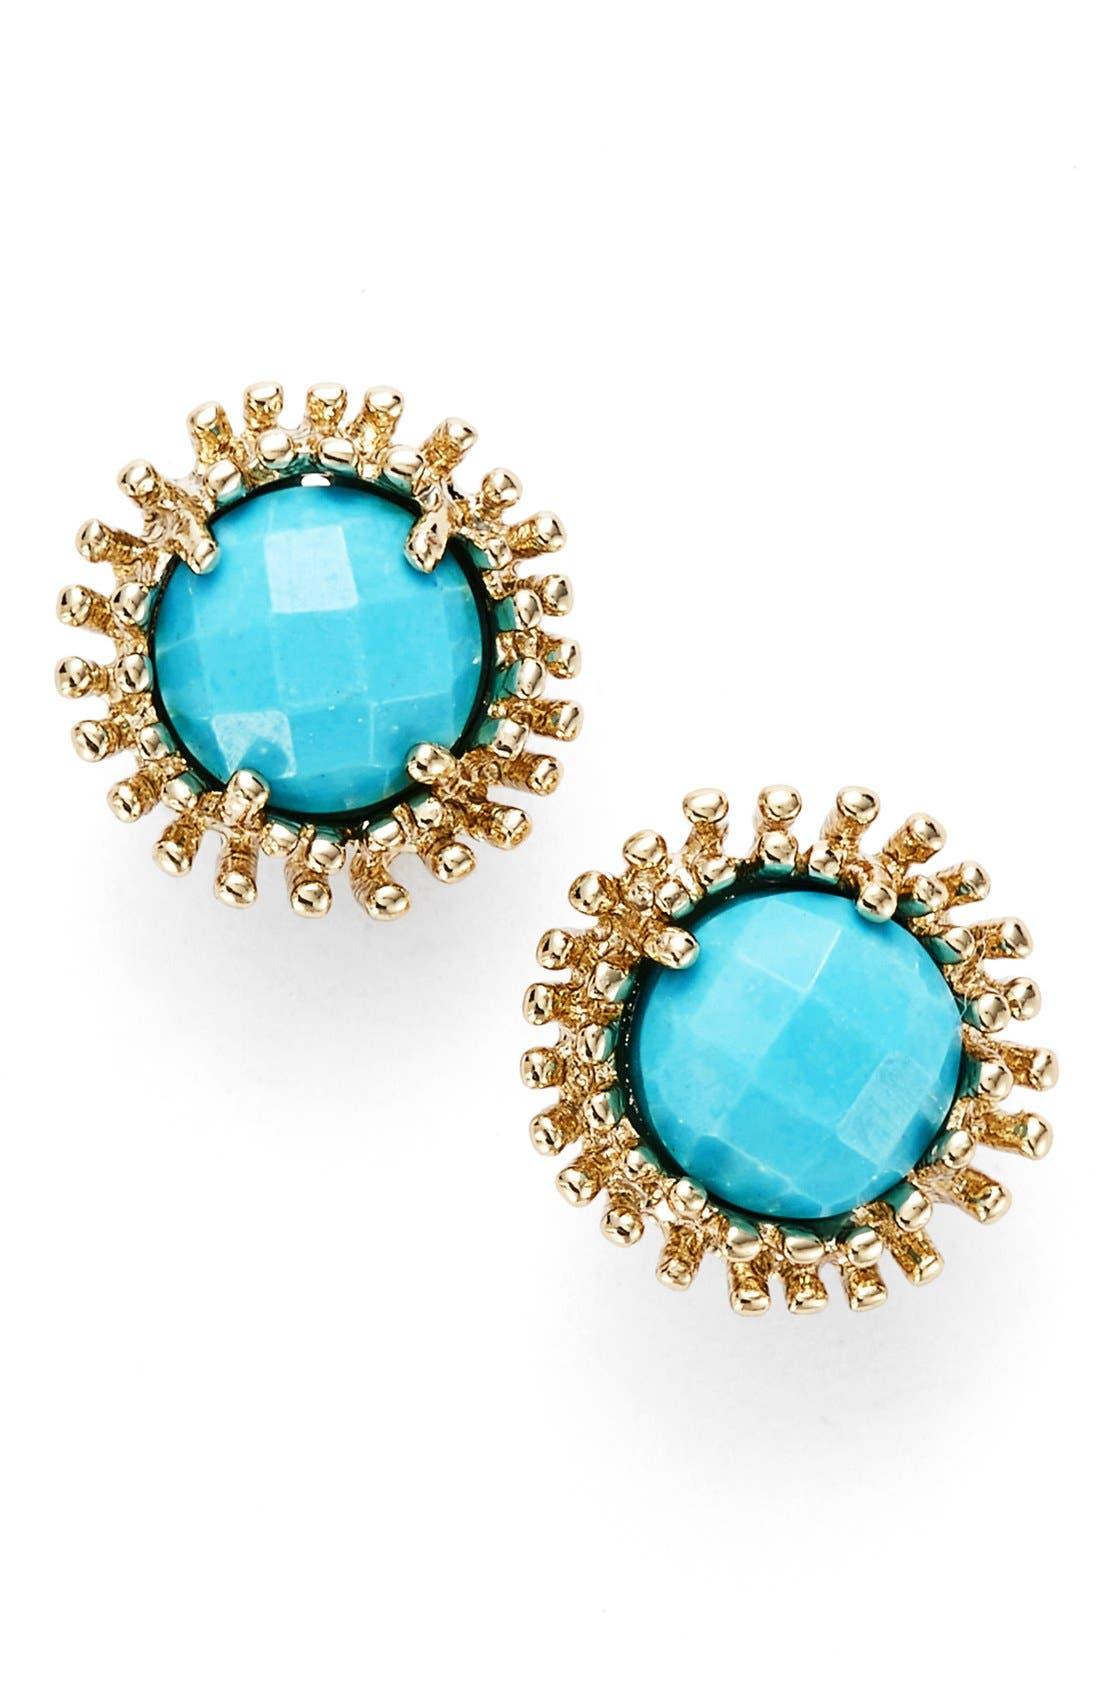 Alternate Image 1 Selected - Kendra Scott 'Carly' Stud Earrings